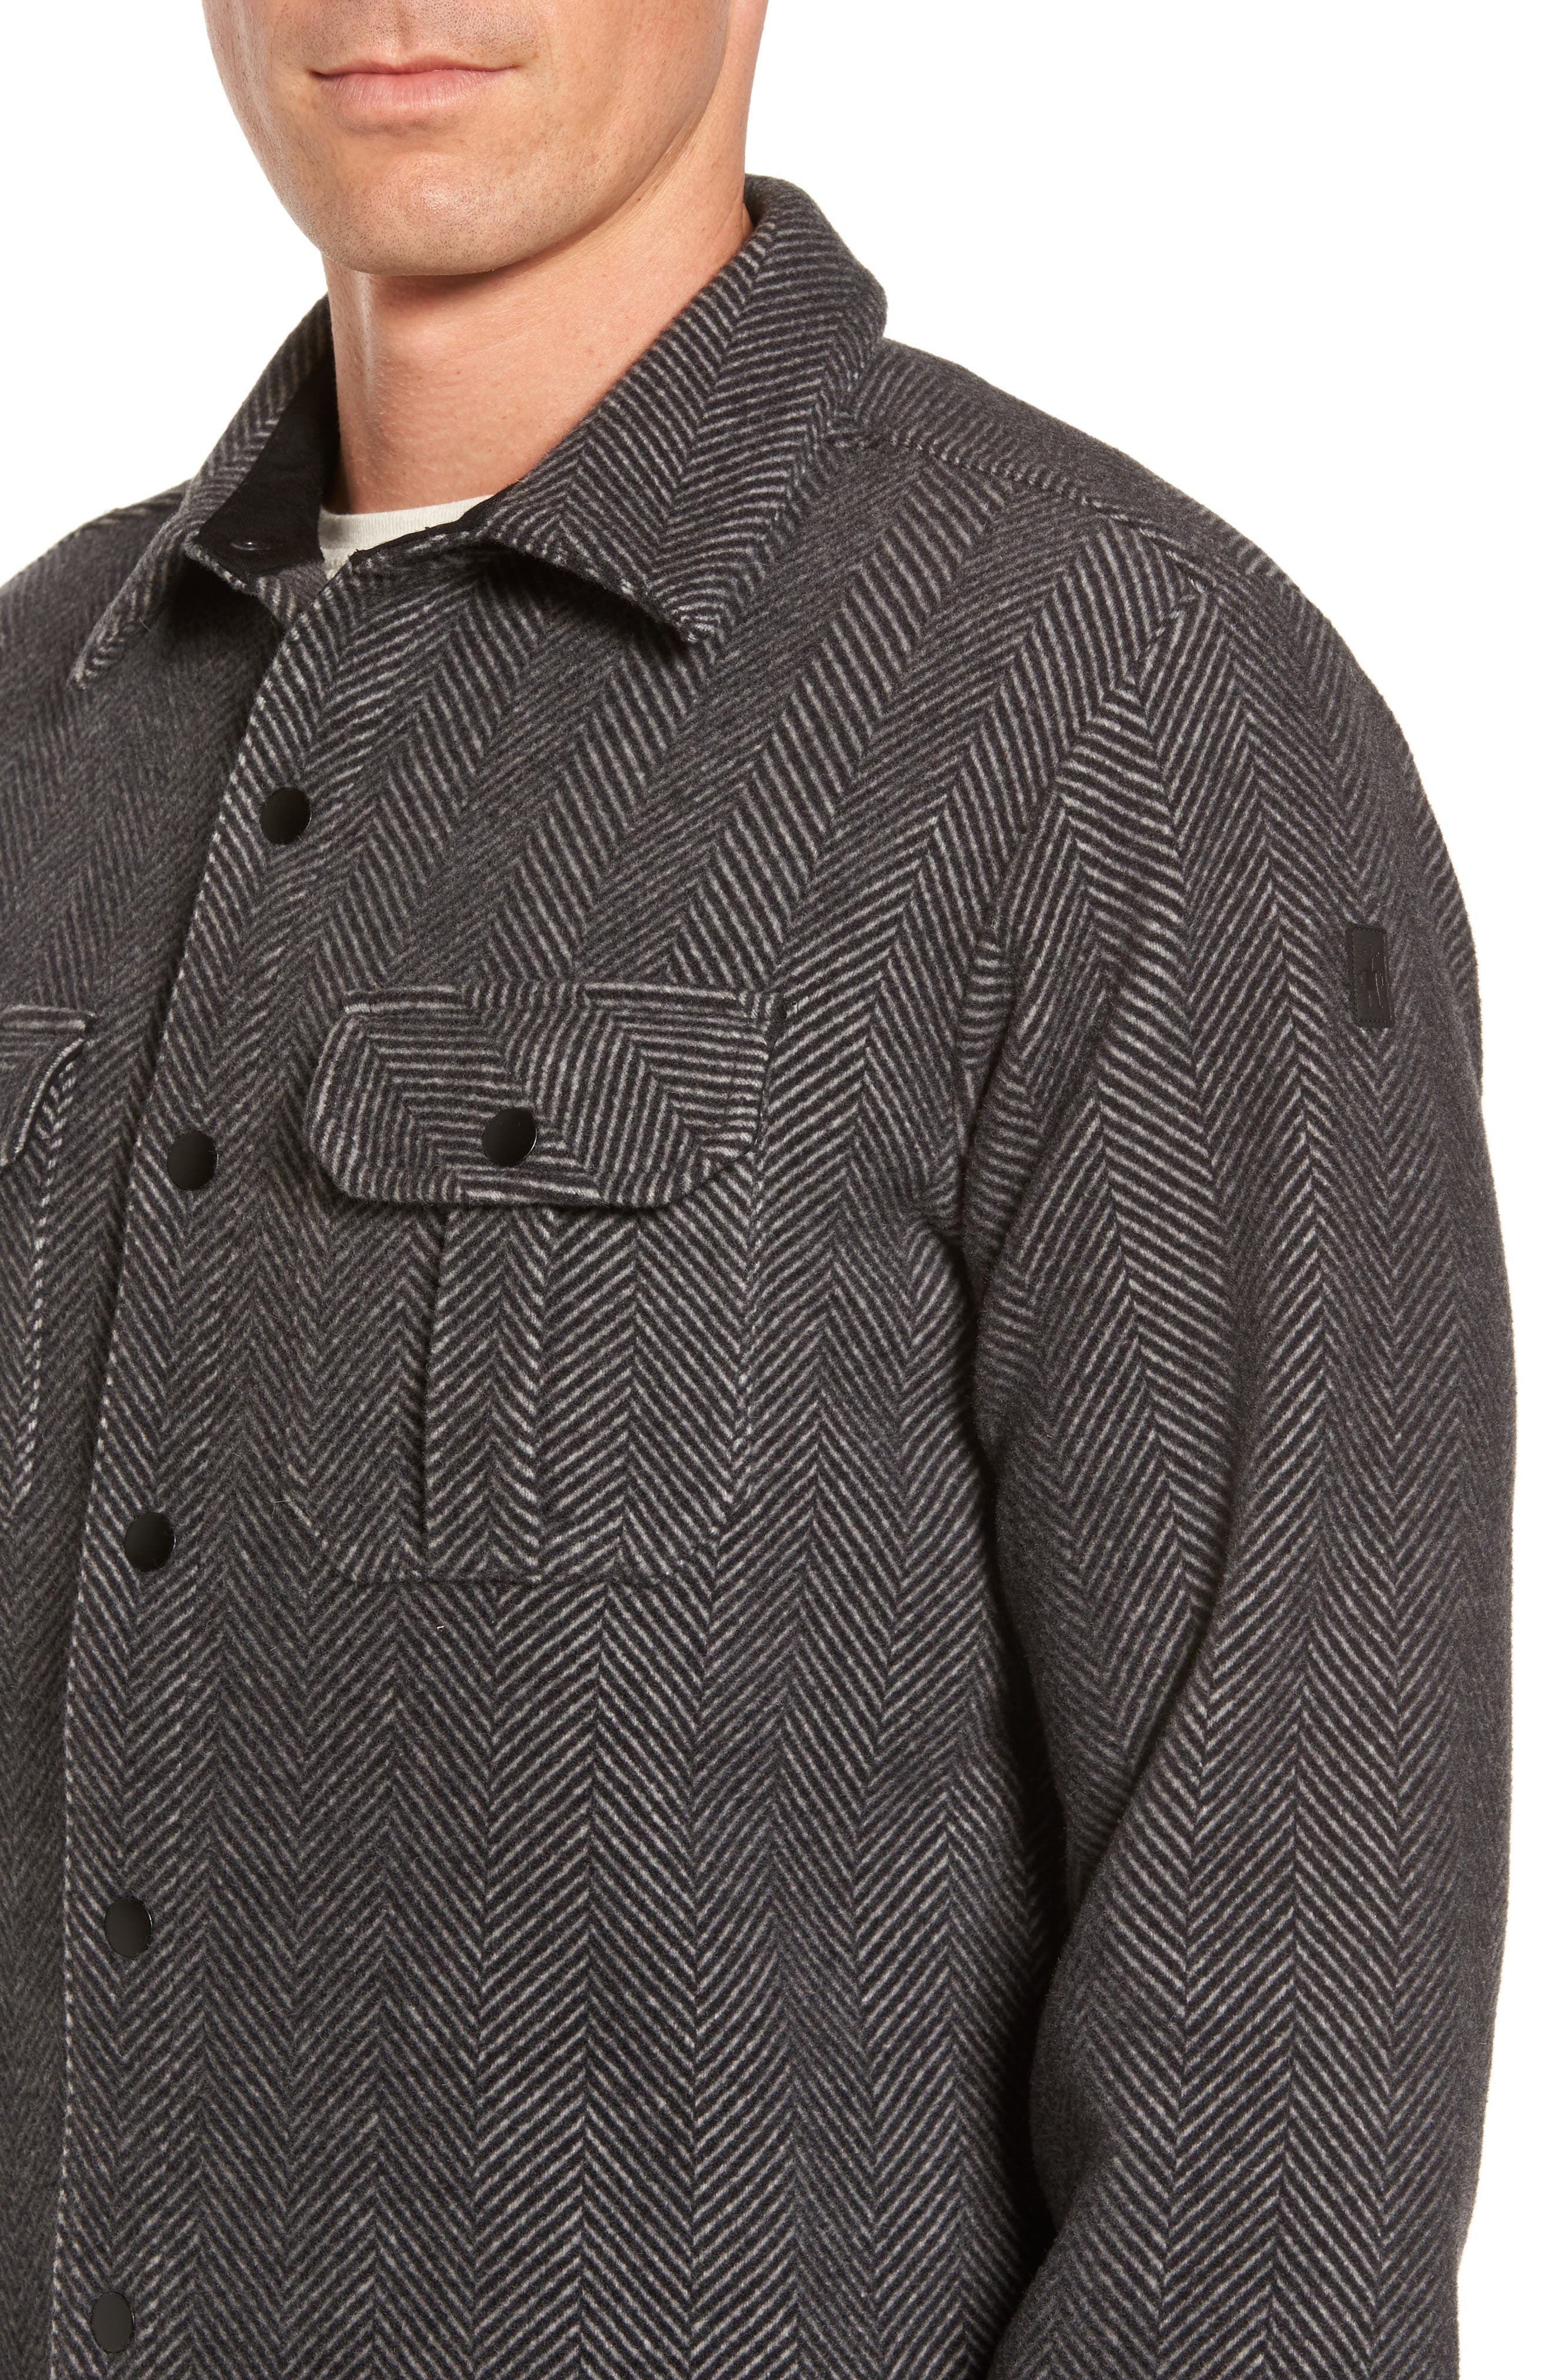 Anchor Line Herringbone Wool Blend Shirt Jacket,                             Alternate thumbnail 4, color,